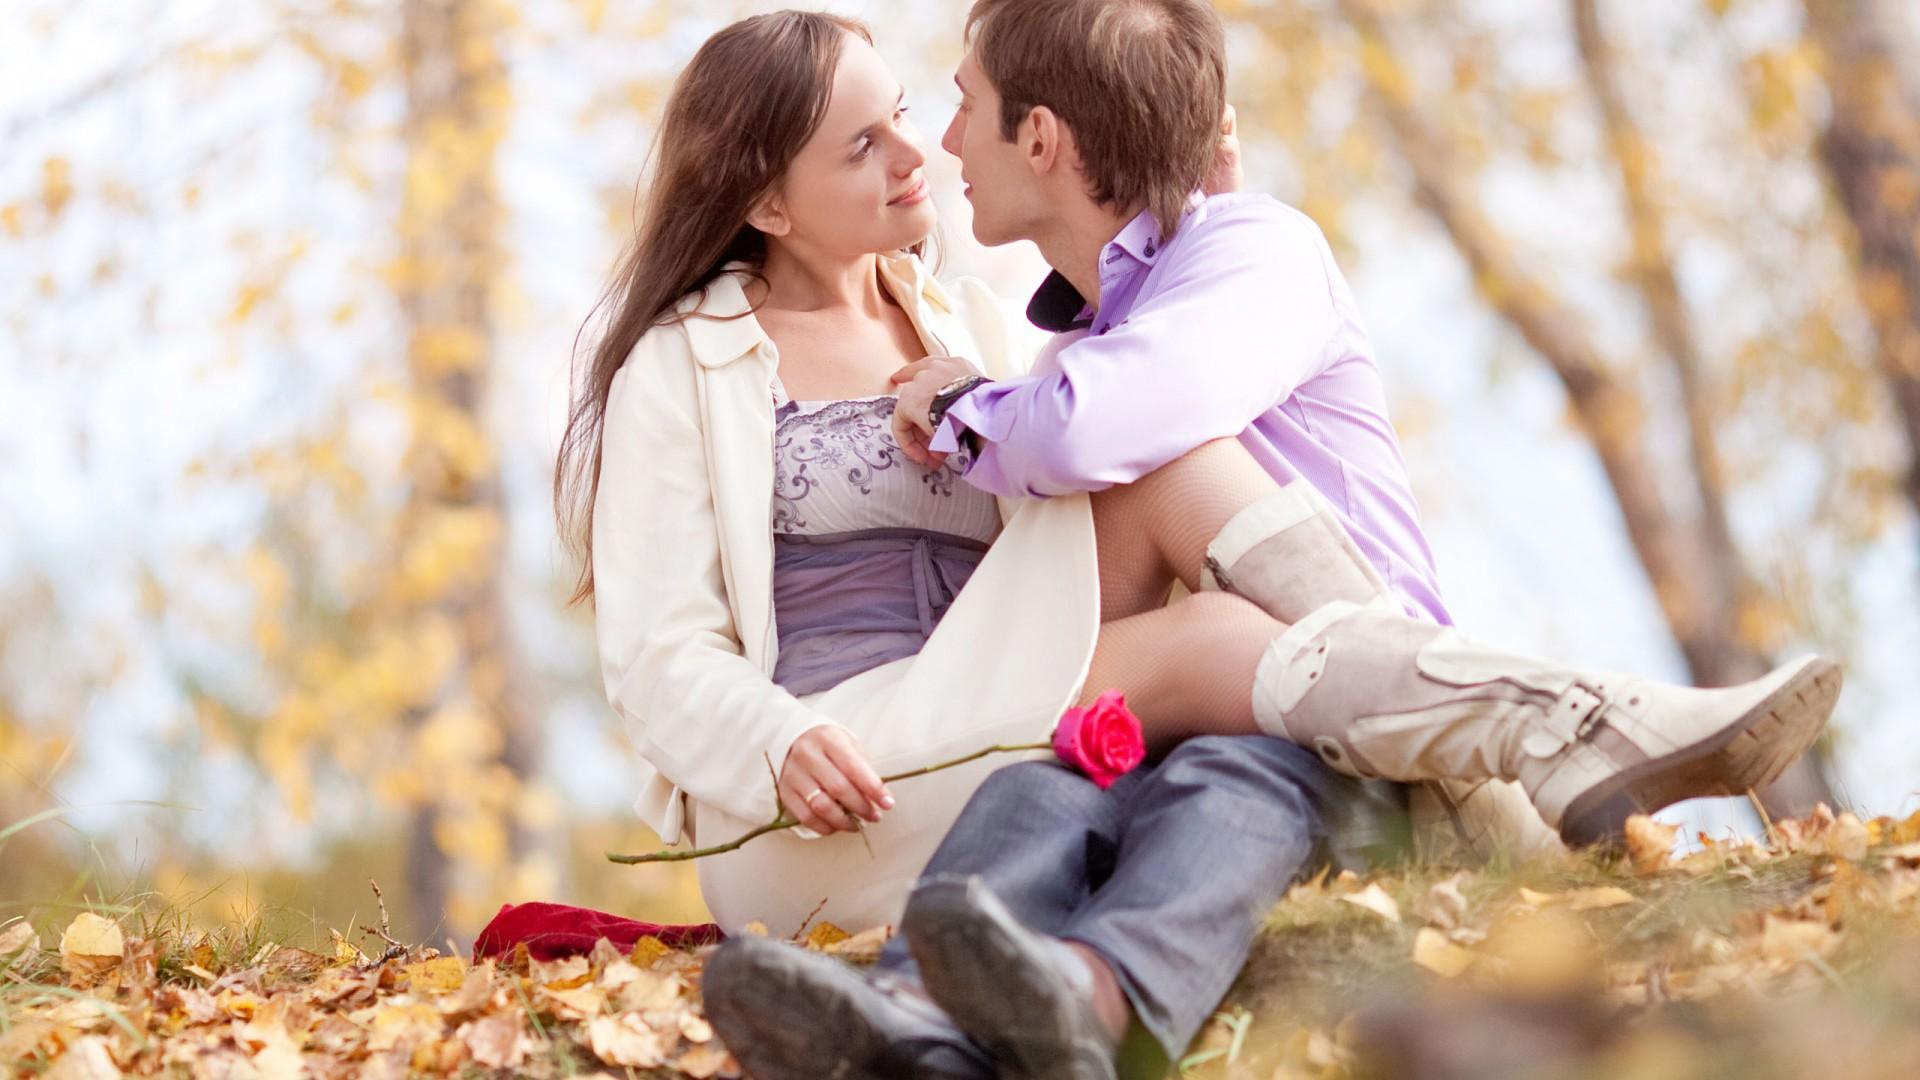 Cute Romantic Love kiss Images